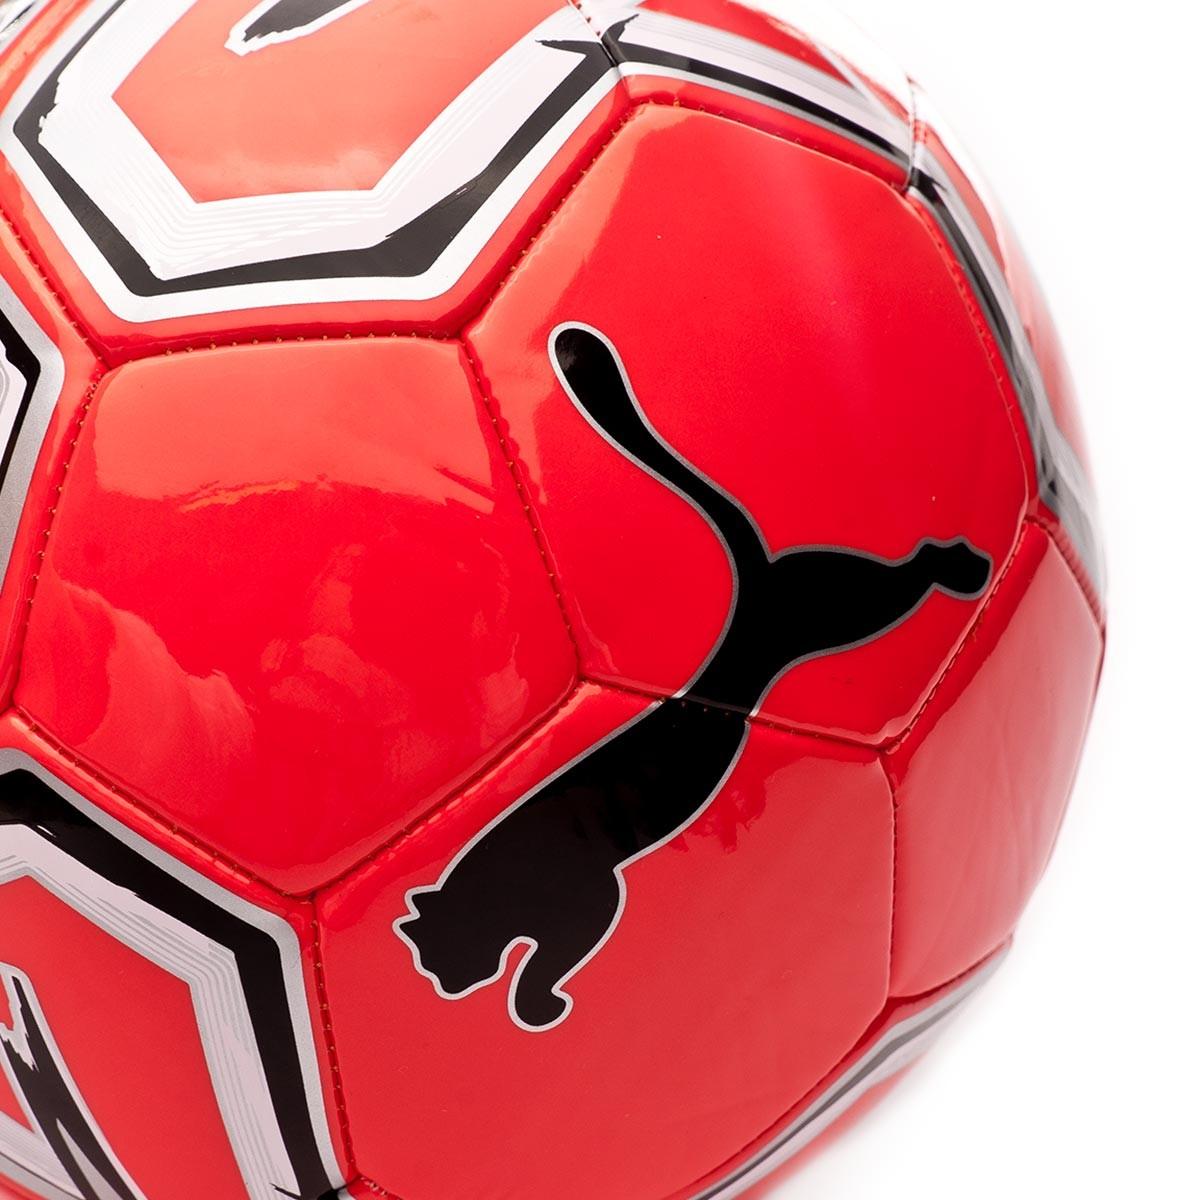 Bola de Futebol Puma Futsal 1 Trainer MS Red blast-Black-White - Loja de  futebol Fútbol Emotion 5fe4b76aa9185